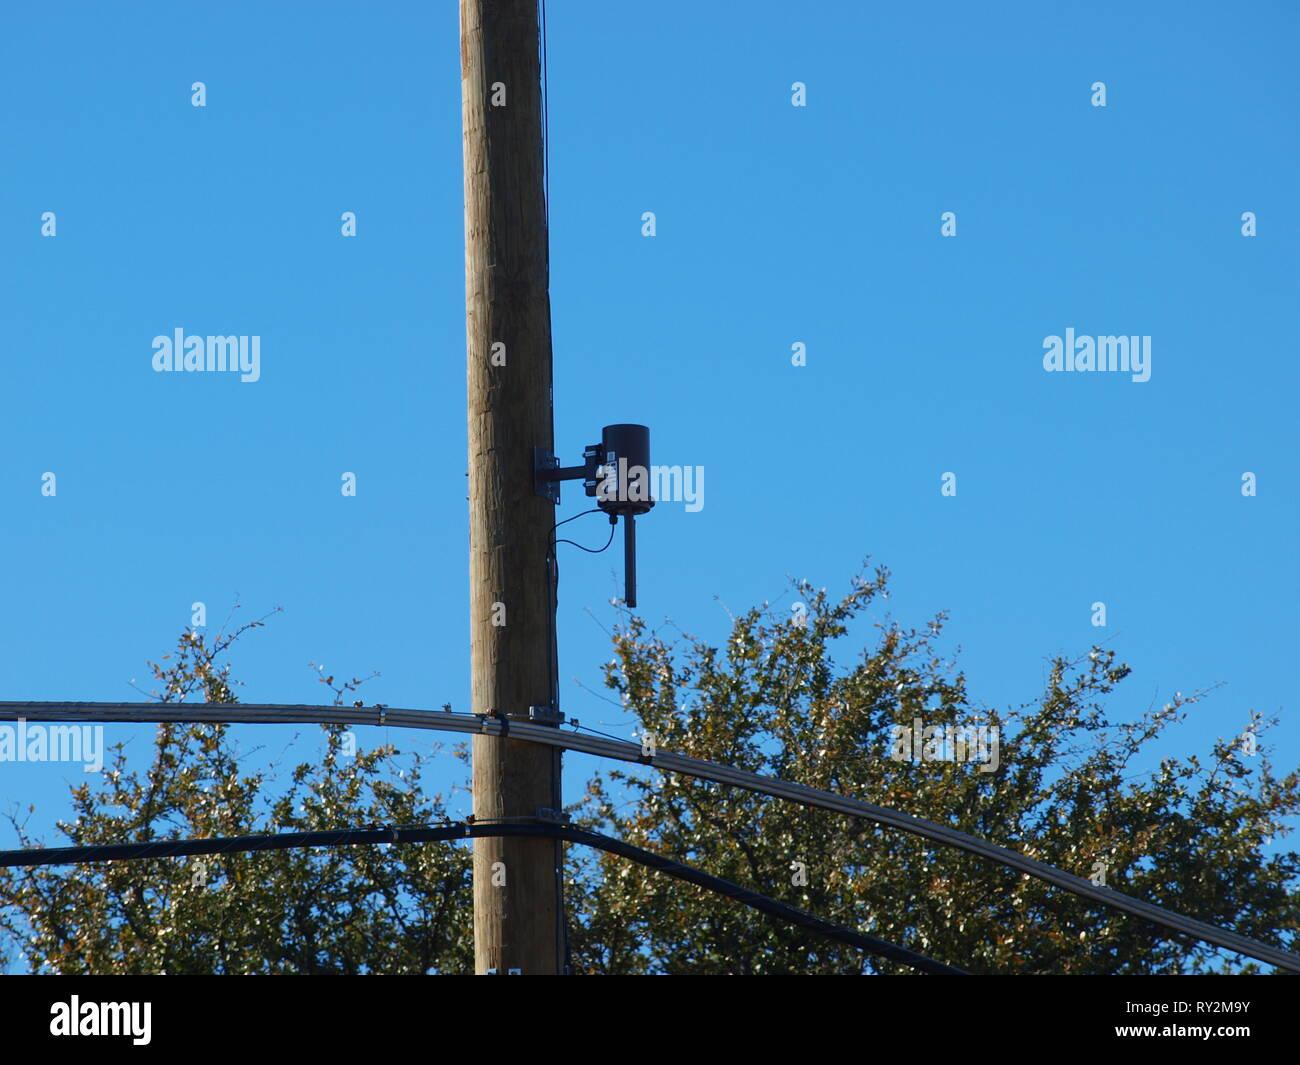 5G Technology Radiates Dallas Metroplex - OL7837922 - Stock Image